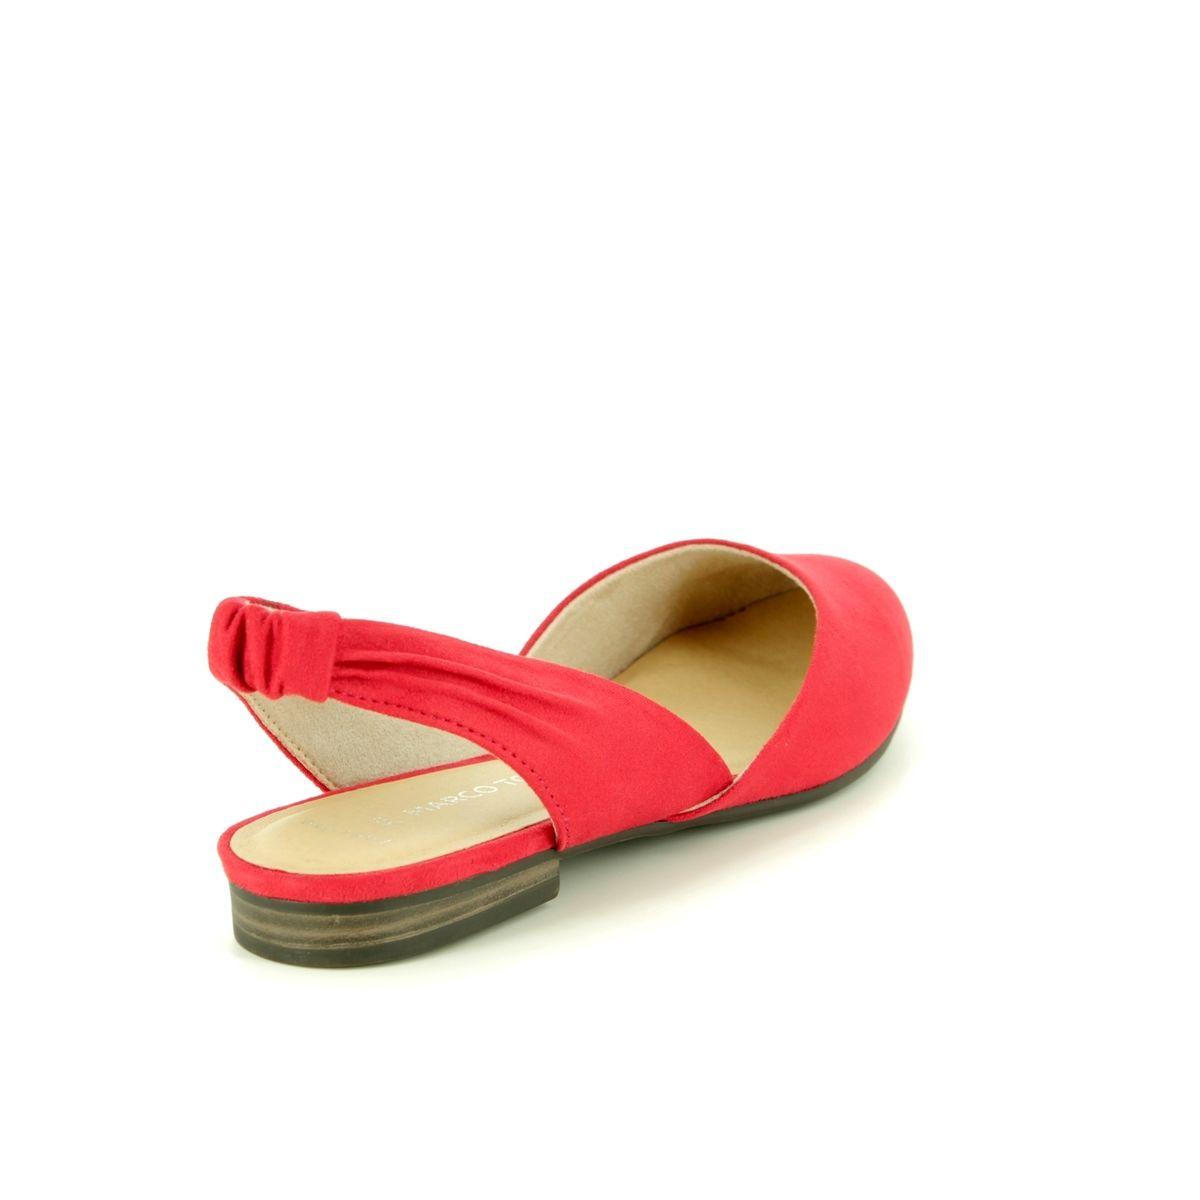 327c5f82a070a Marco Tozzi Closed Toe Sandals - Red - 29407/32/533 BRAVISLING